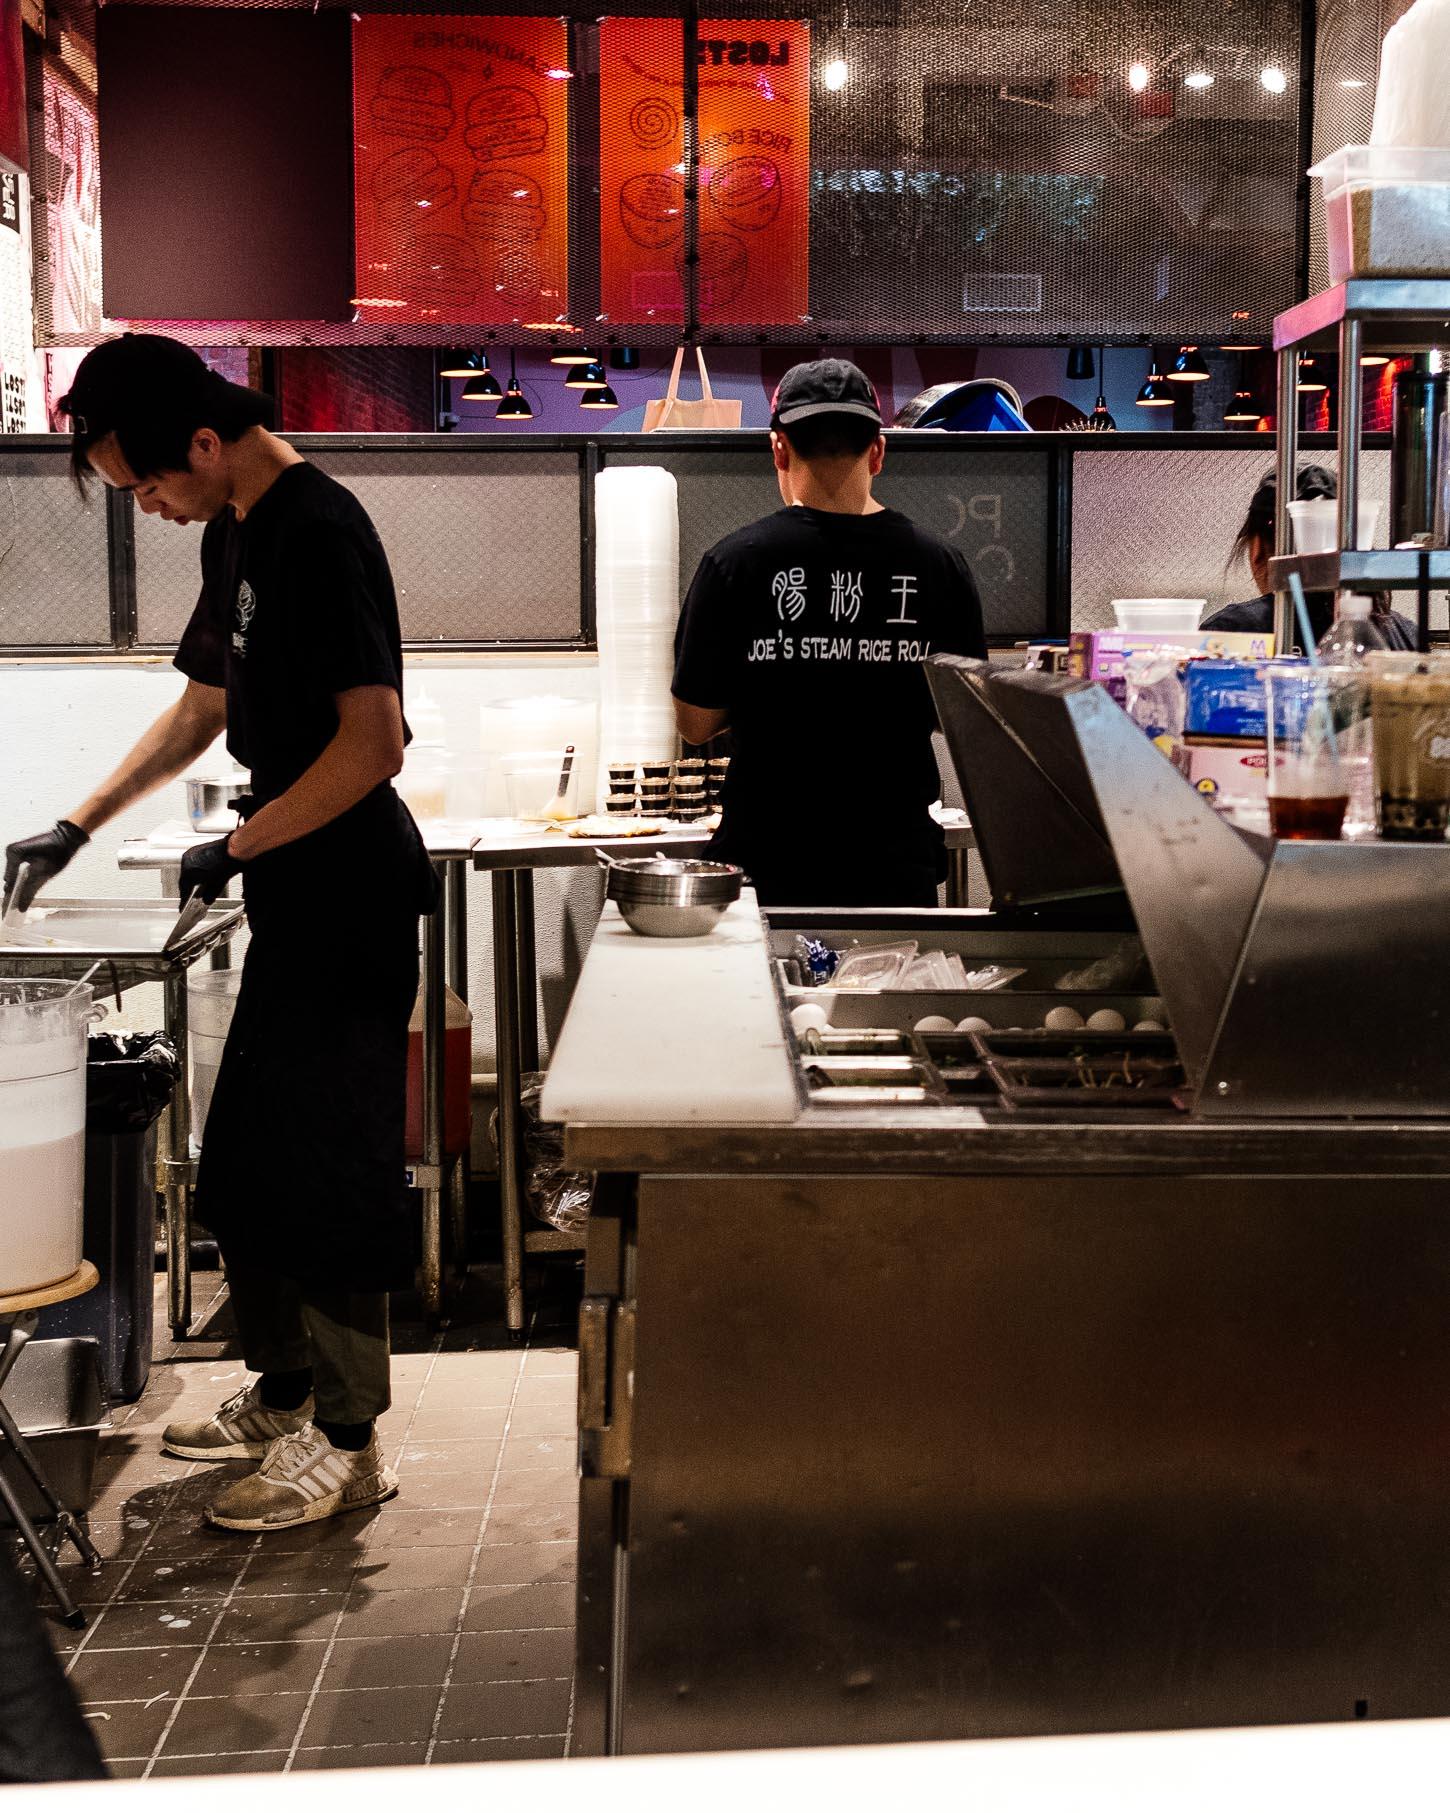 Joe's Steam Rice Roll | www.iamafoodblog.com